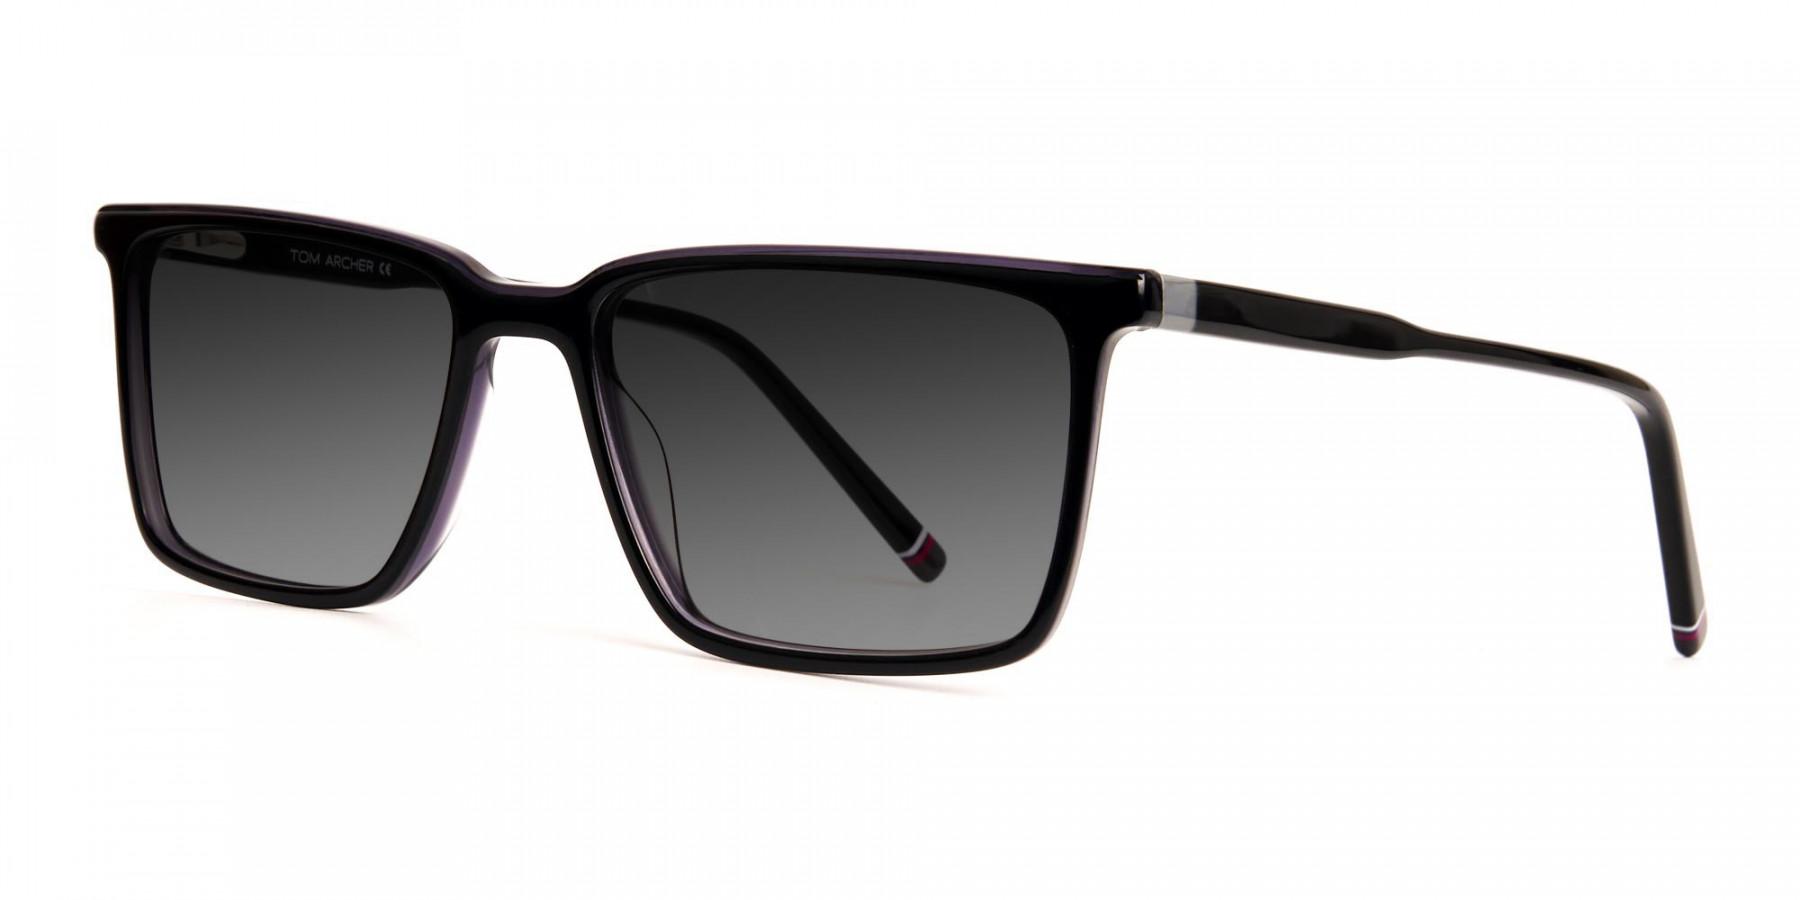 dark-purple-full-rim-rectangular-grey-tinted-sunglasses-frames-3